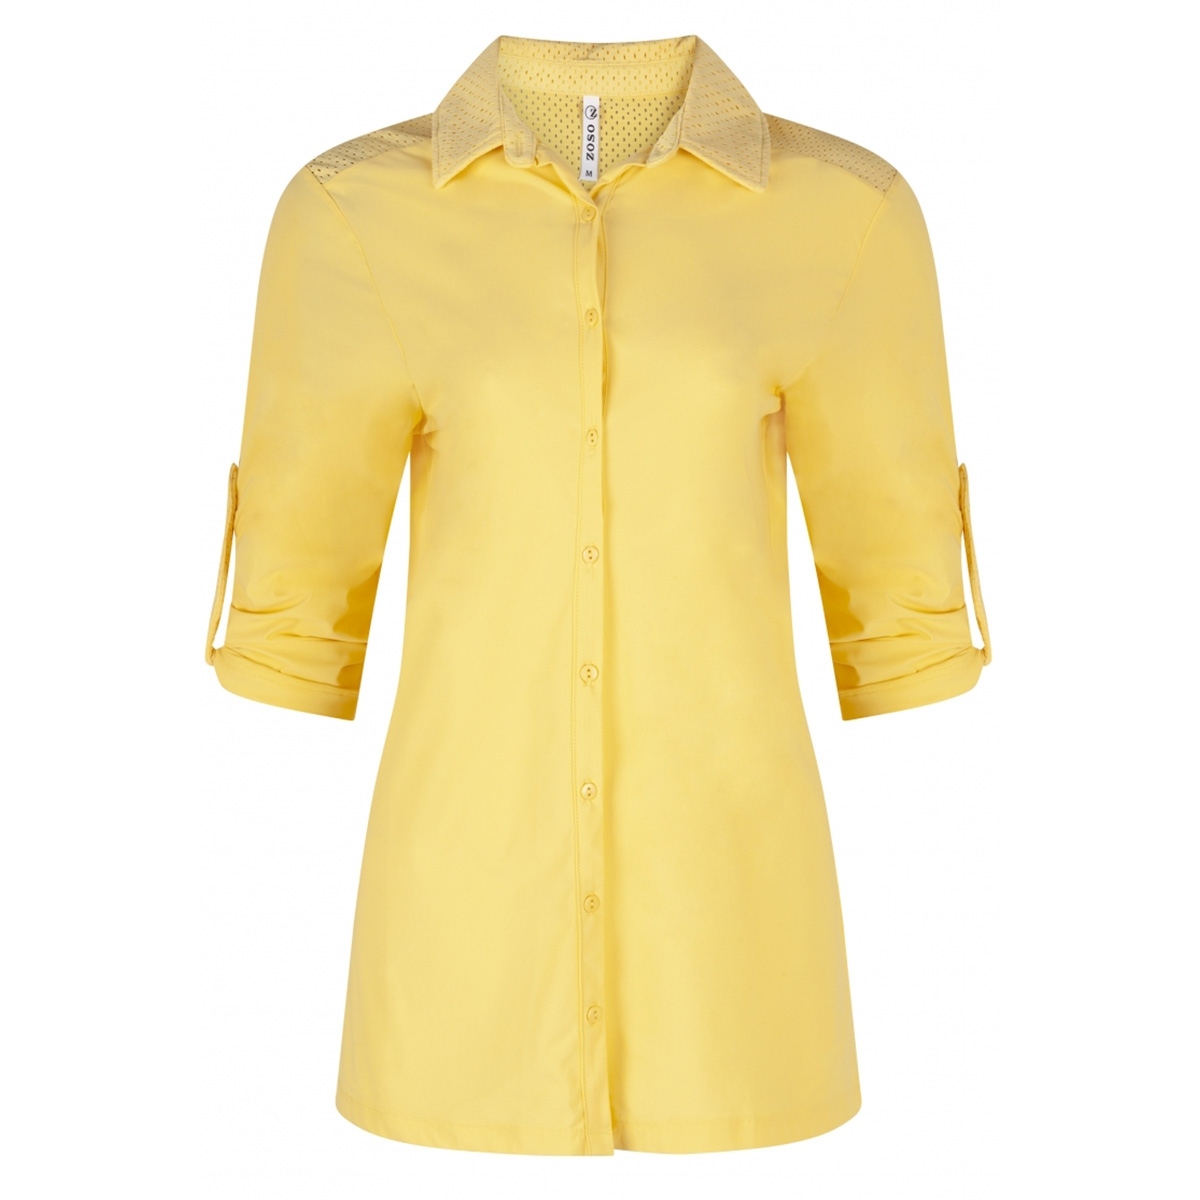 hope travel blouse 192 zoso blouse 0020 yellow